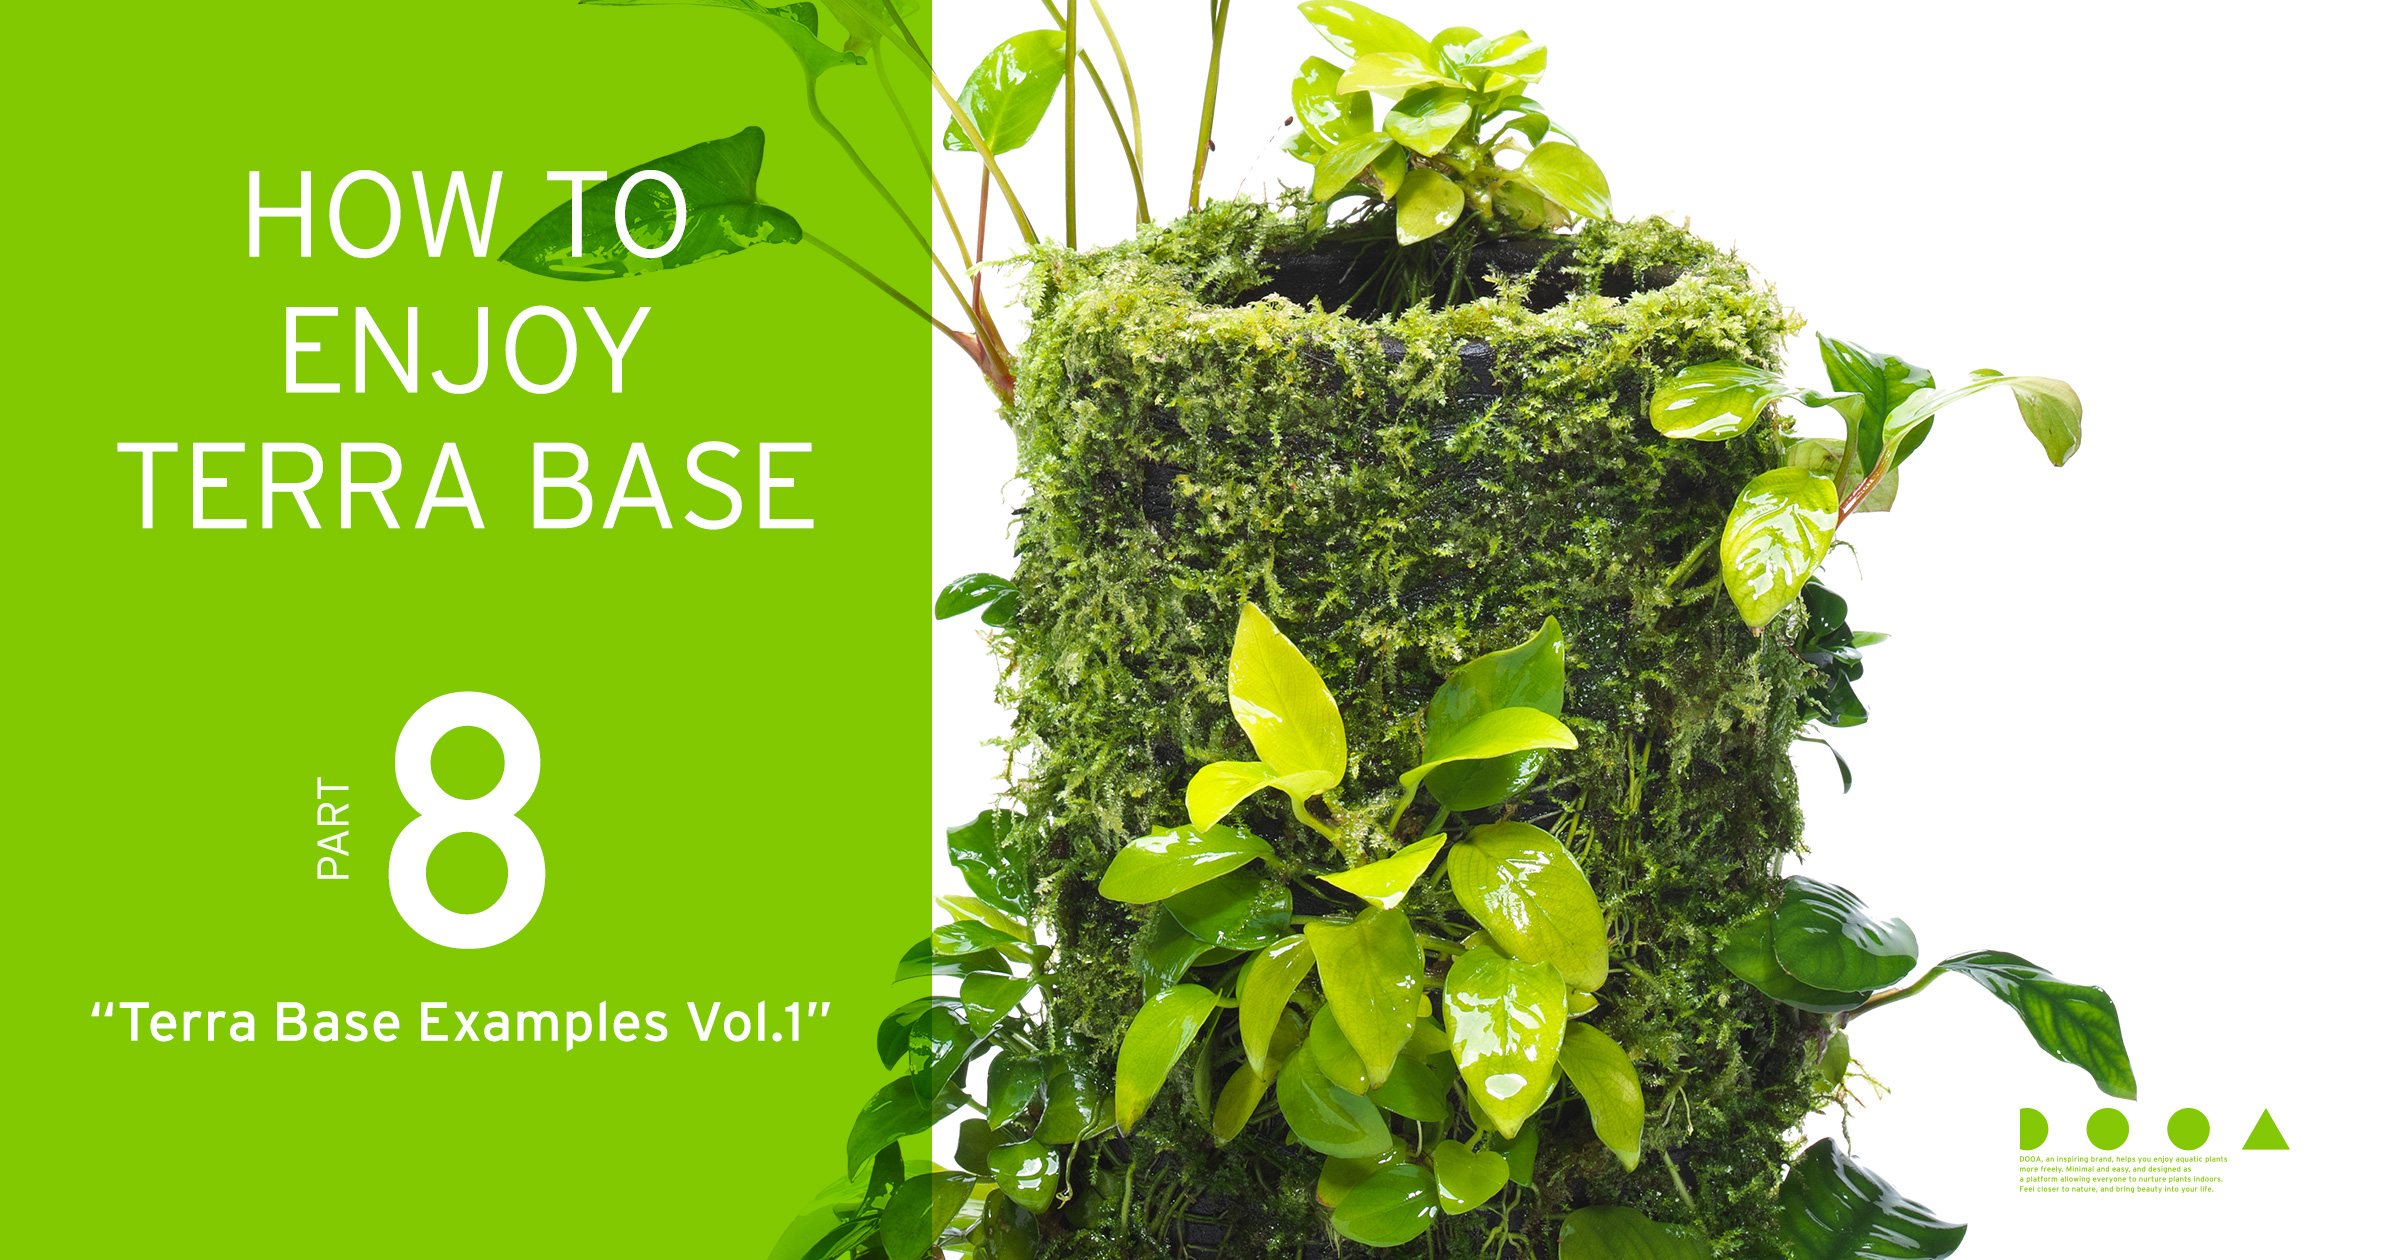 "HOW TO ENJOY TERRA BASE ""Terra Base Examples Vol.1"""